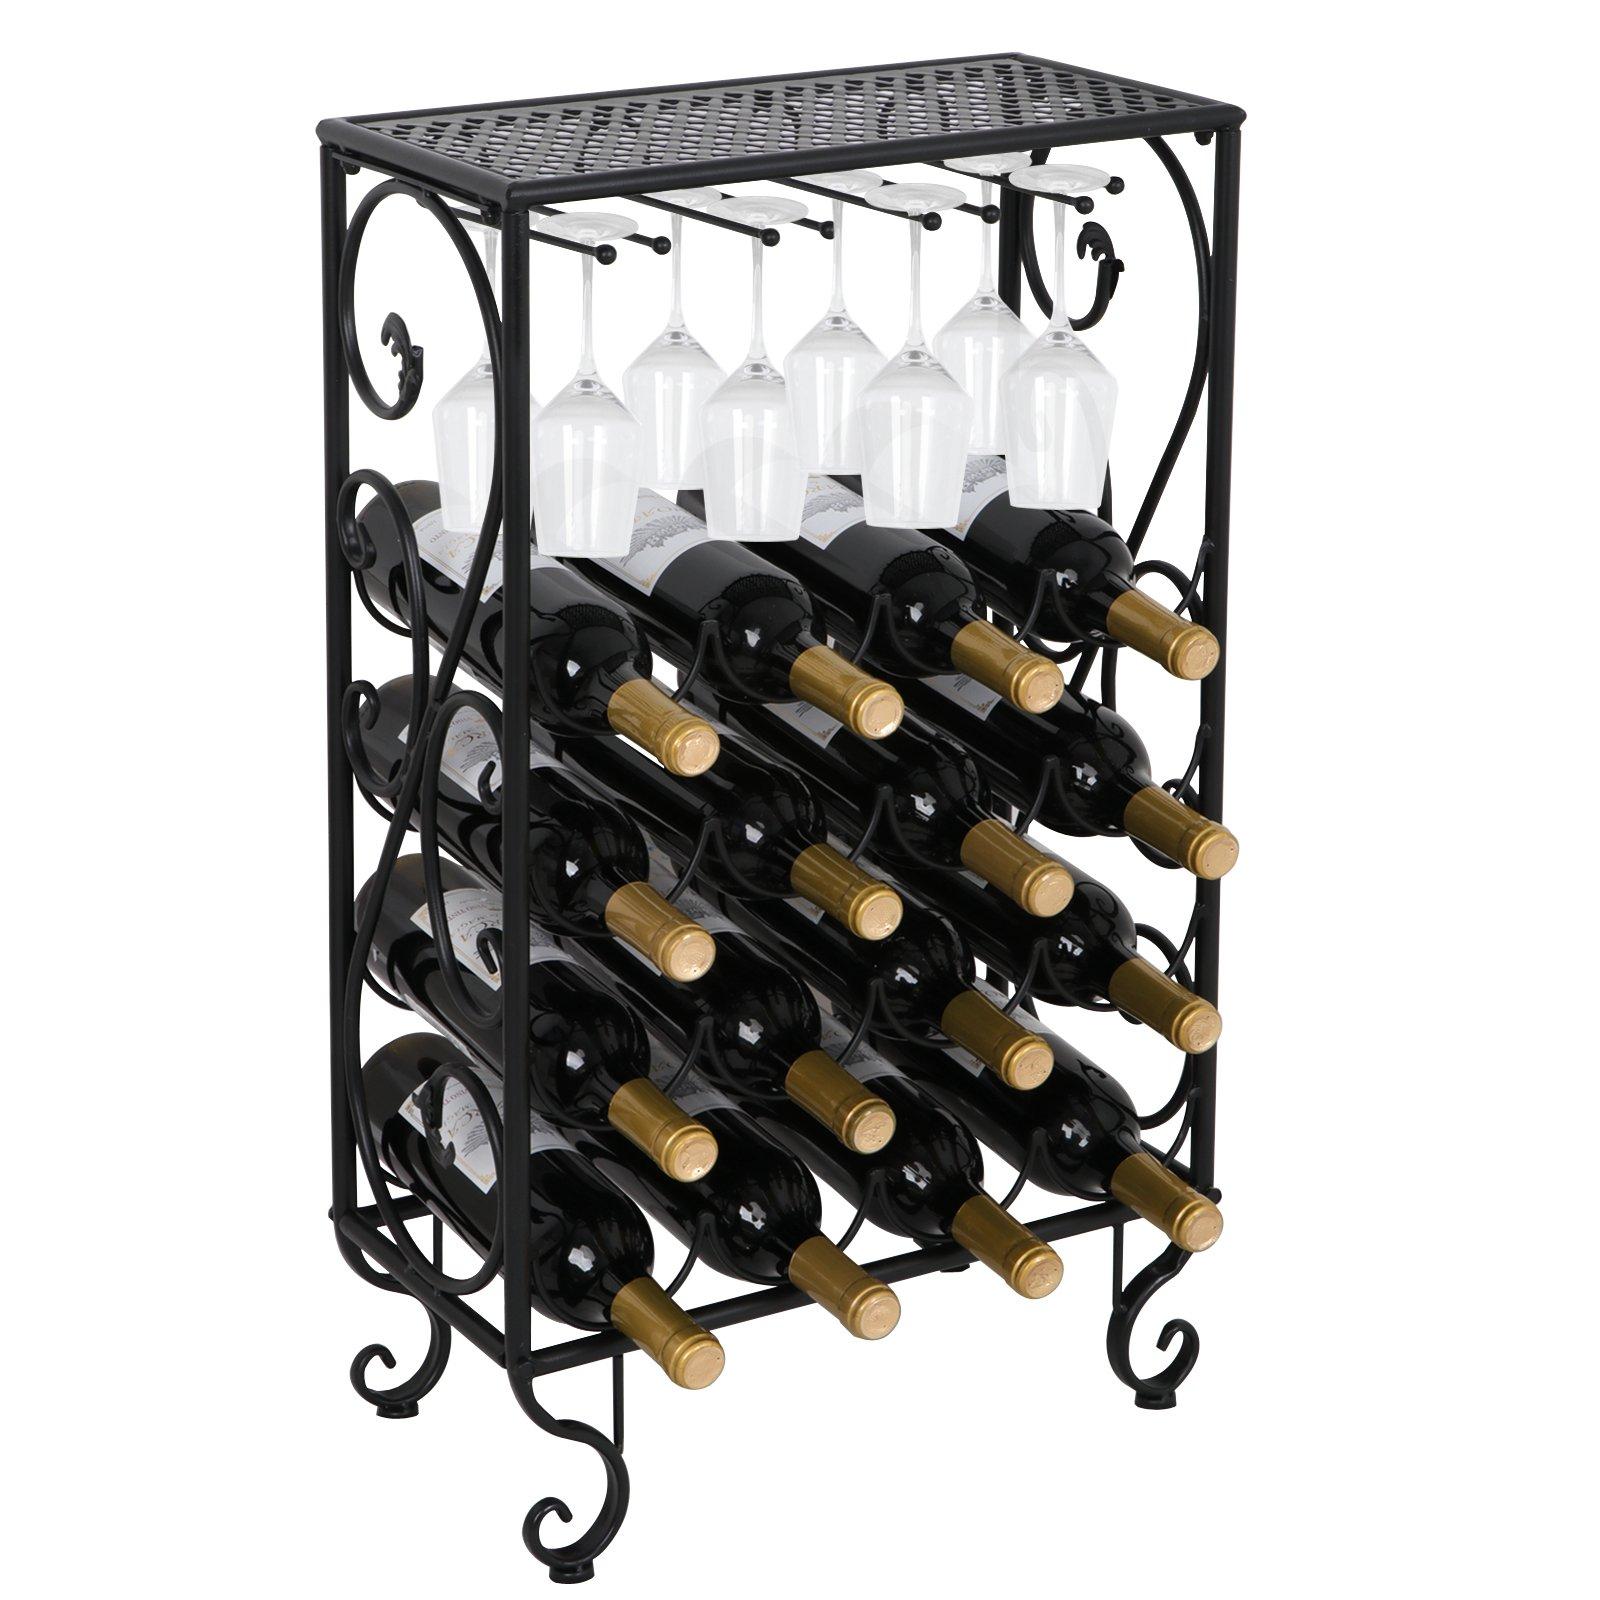 Smartxchoices 16 Wine Rack Table with Glass Holder Tabletop Wine Bottle Holder Storage Shelf Kitchen Shelf by Smartxchoices